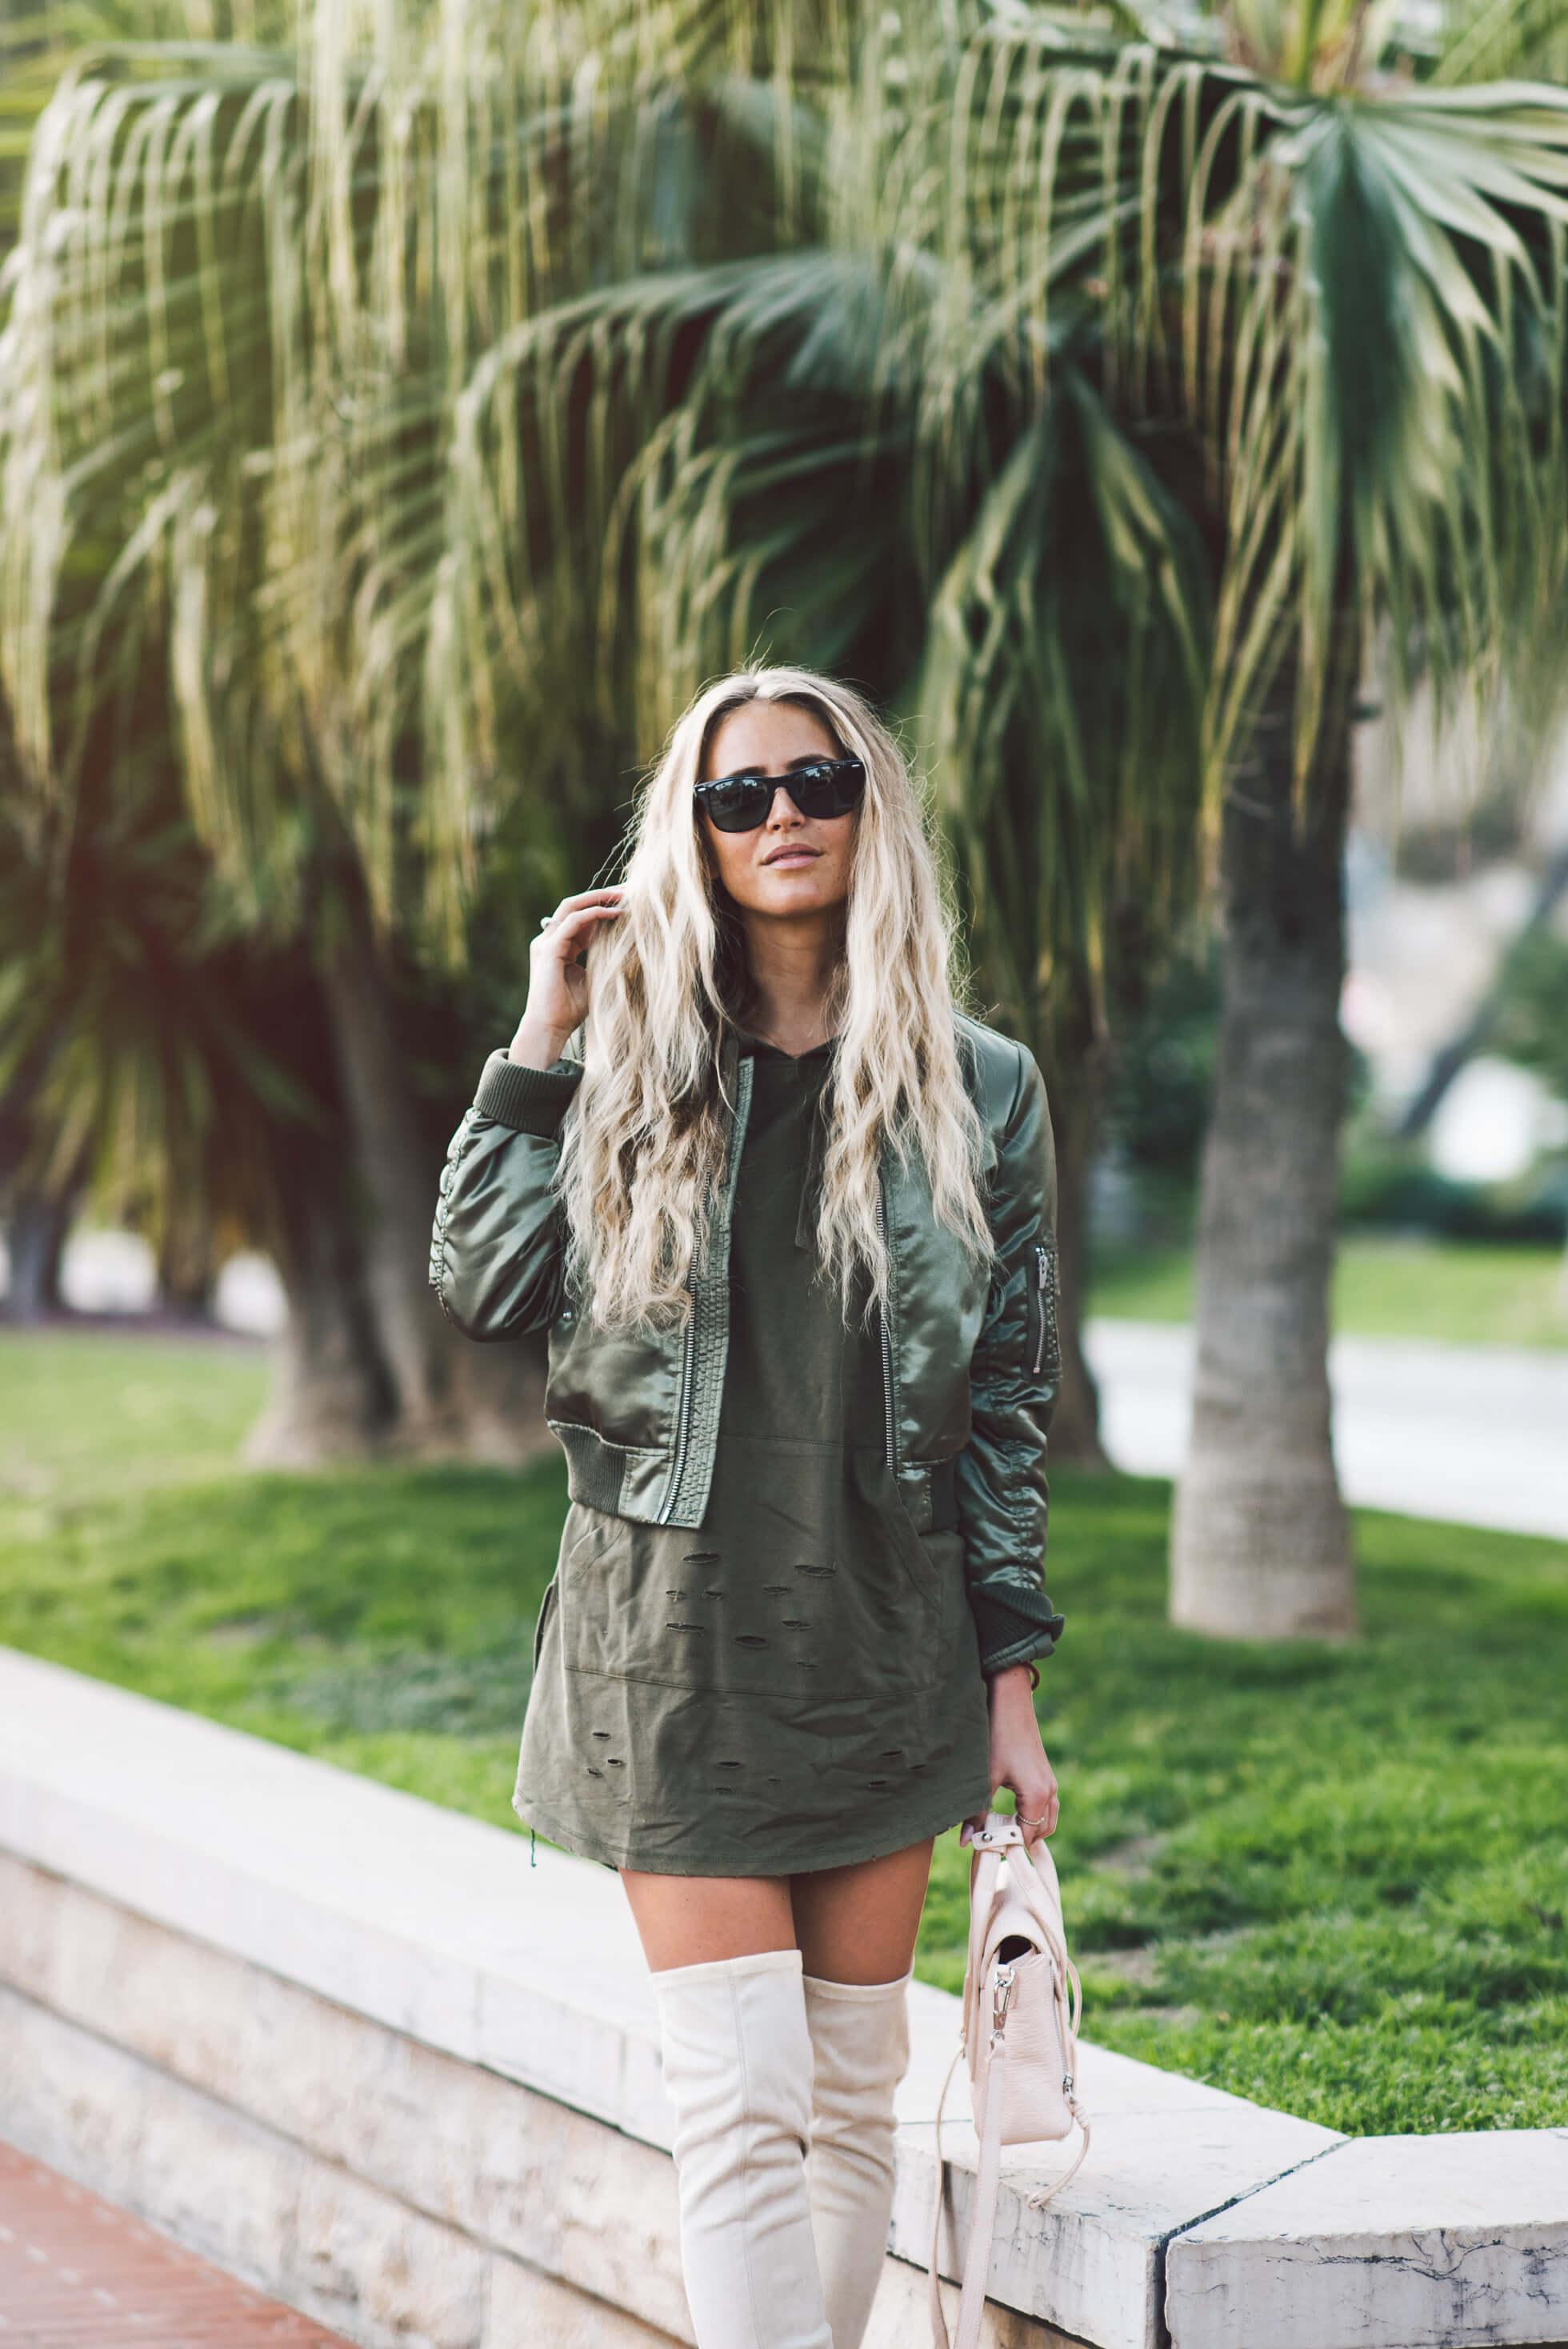 janni-deler-green-outfitDSC_9151-Redigera